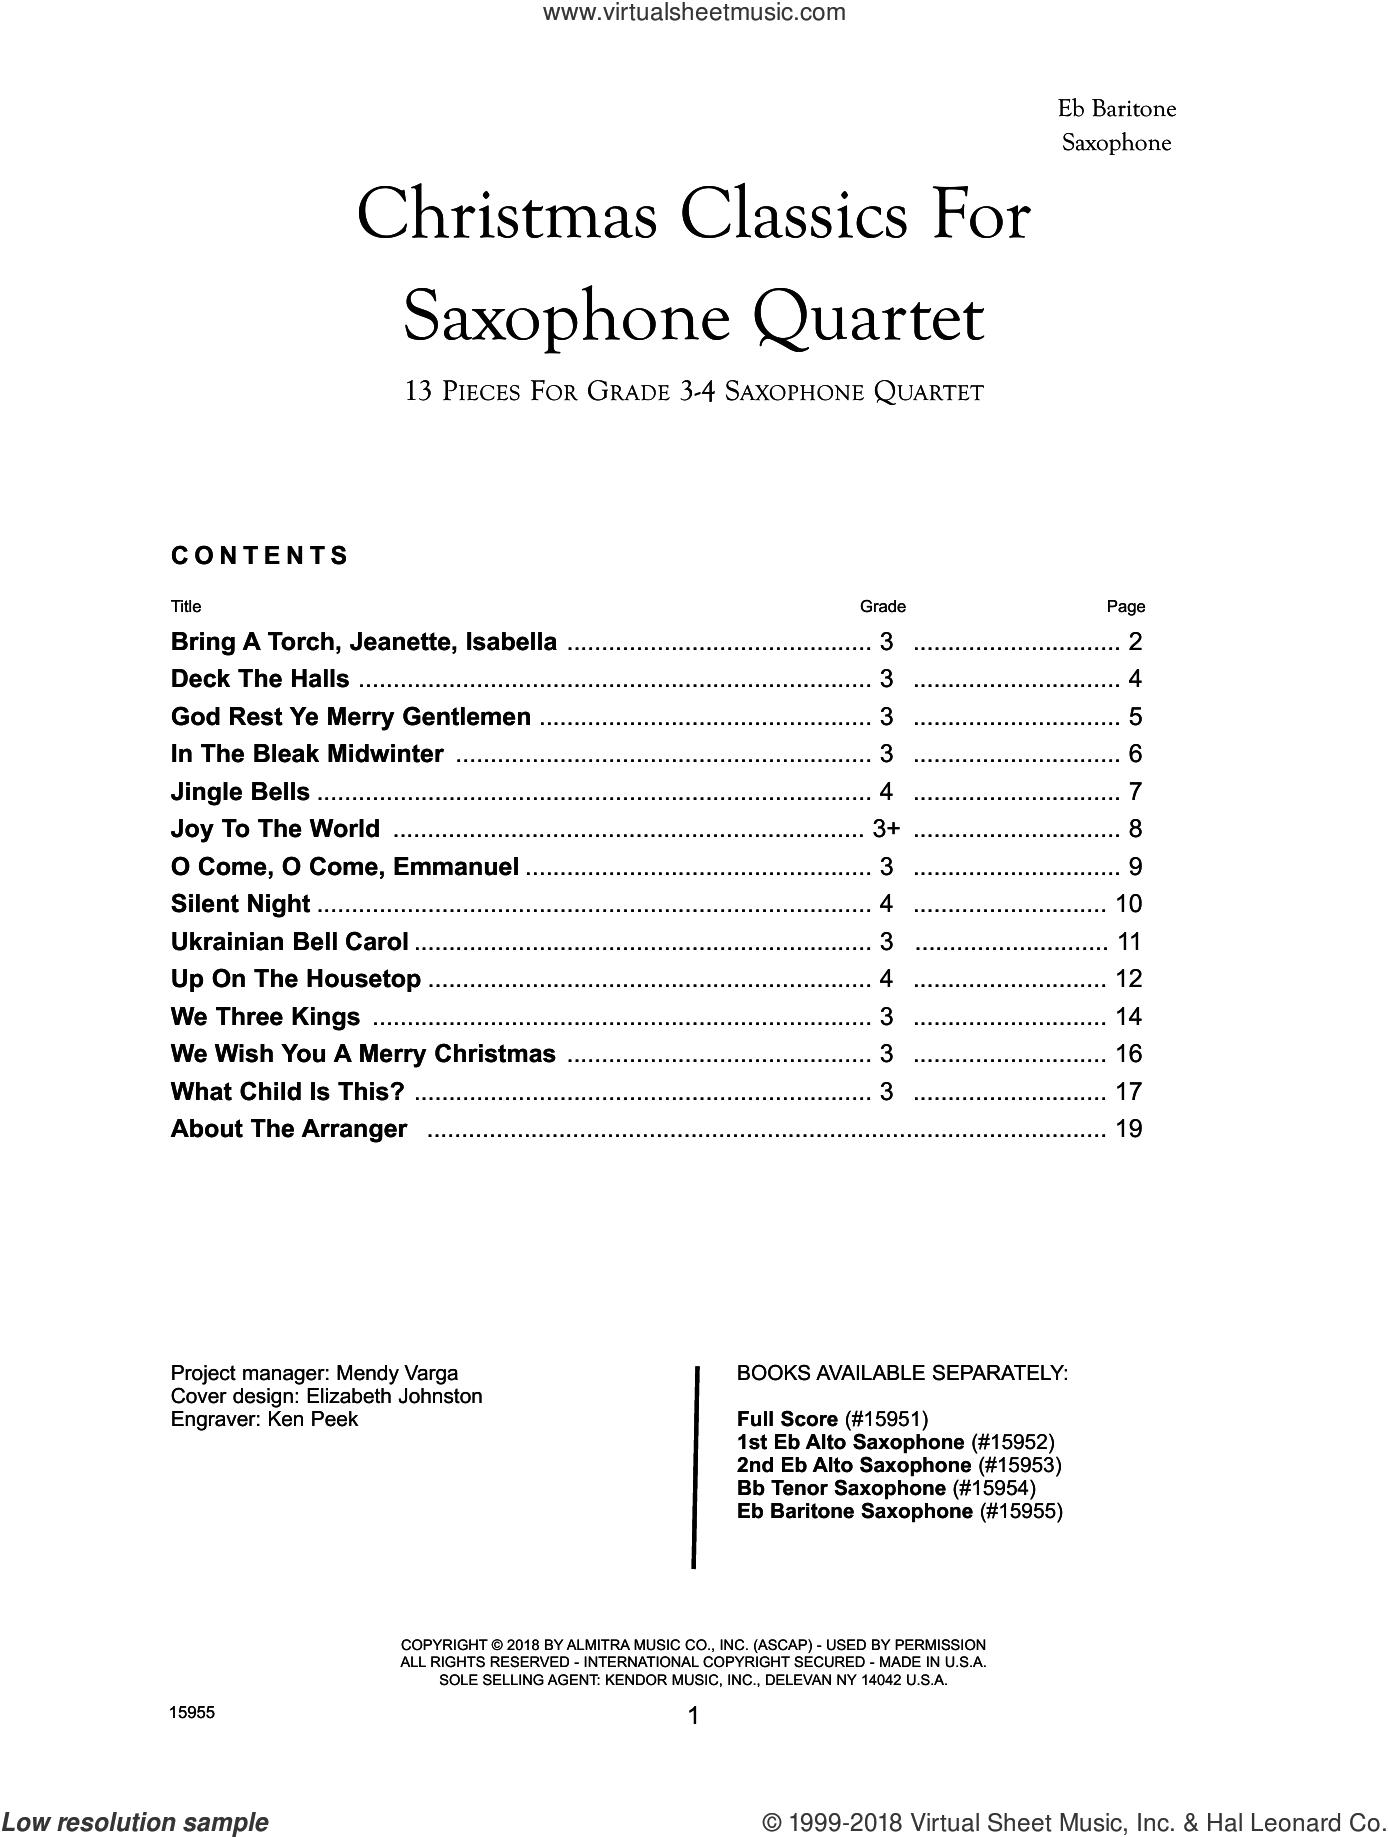 Christmas Classics For Saxophone Quartet - Eb Baritone Saxophone sheet music for saxophone quartet by Frank J. Halferty, intermediate skill level